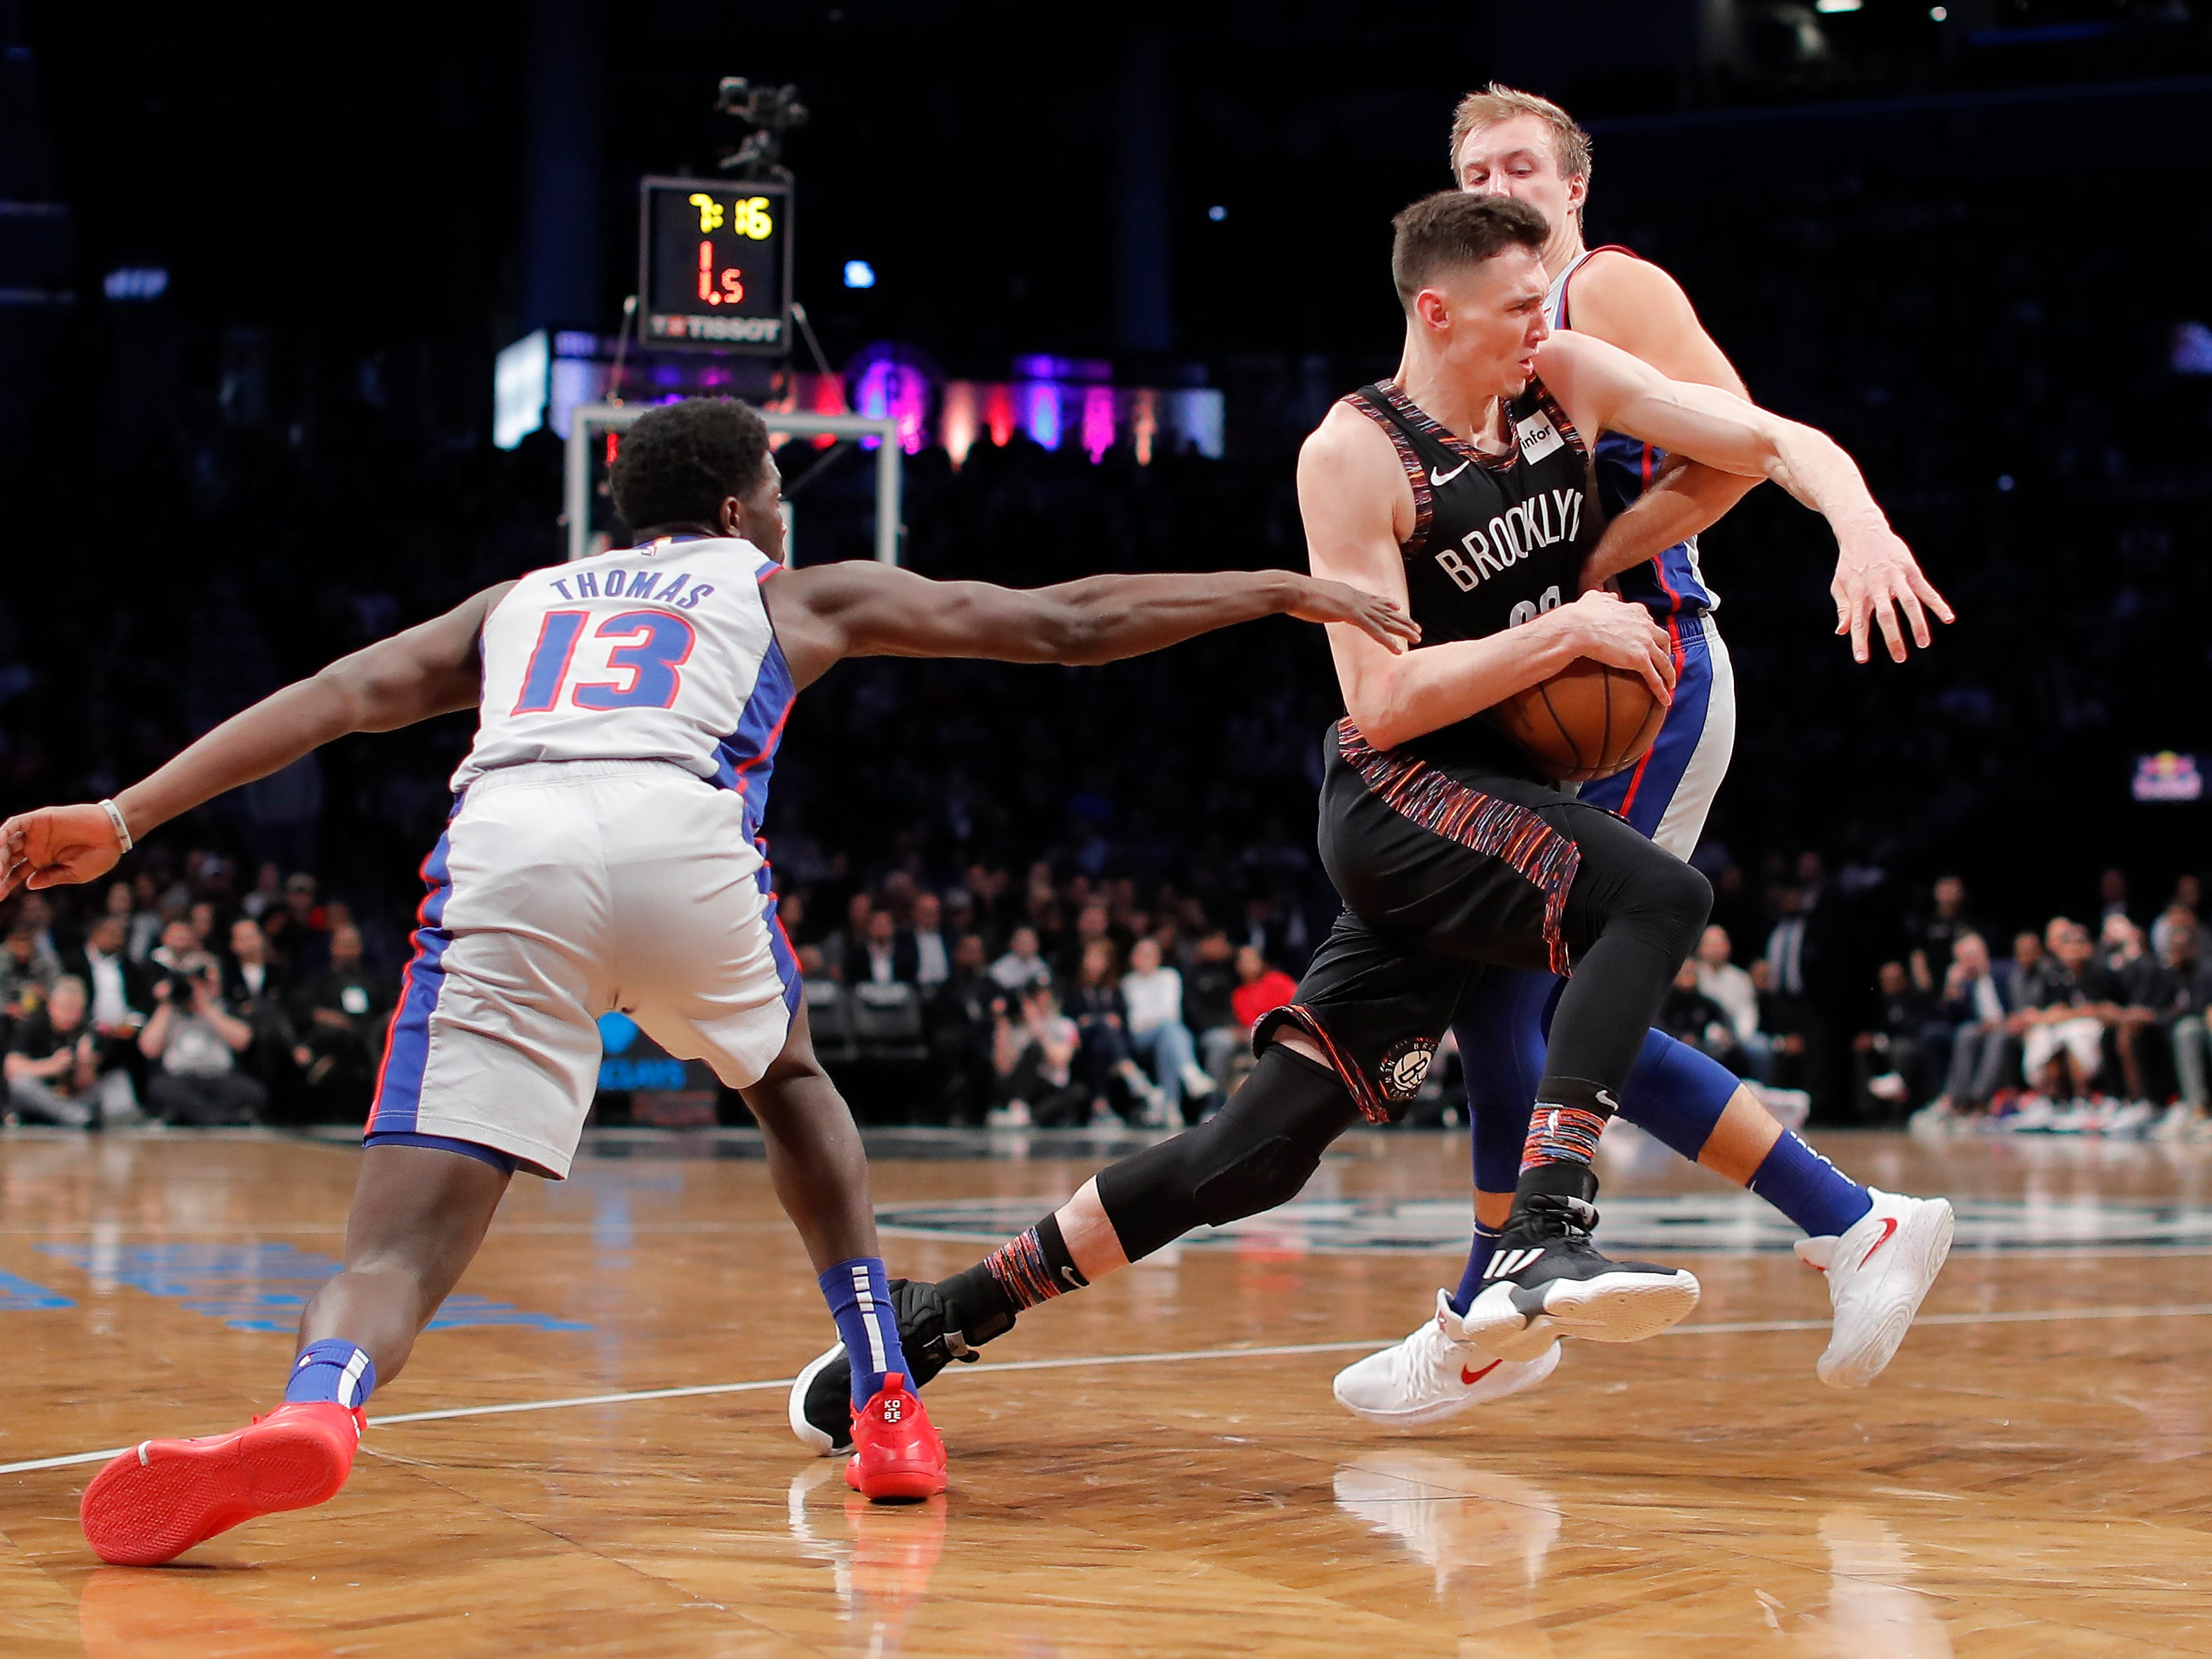 Brooklyn Nets forward Rodions Kurucs (00) drives against Detroit Pistons guard Khyri Thomas (13) and guard Luke Kennard (5) during the fourth quarter.